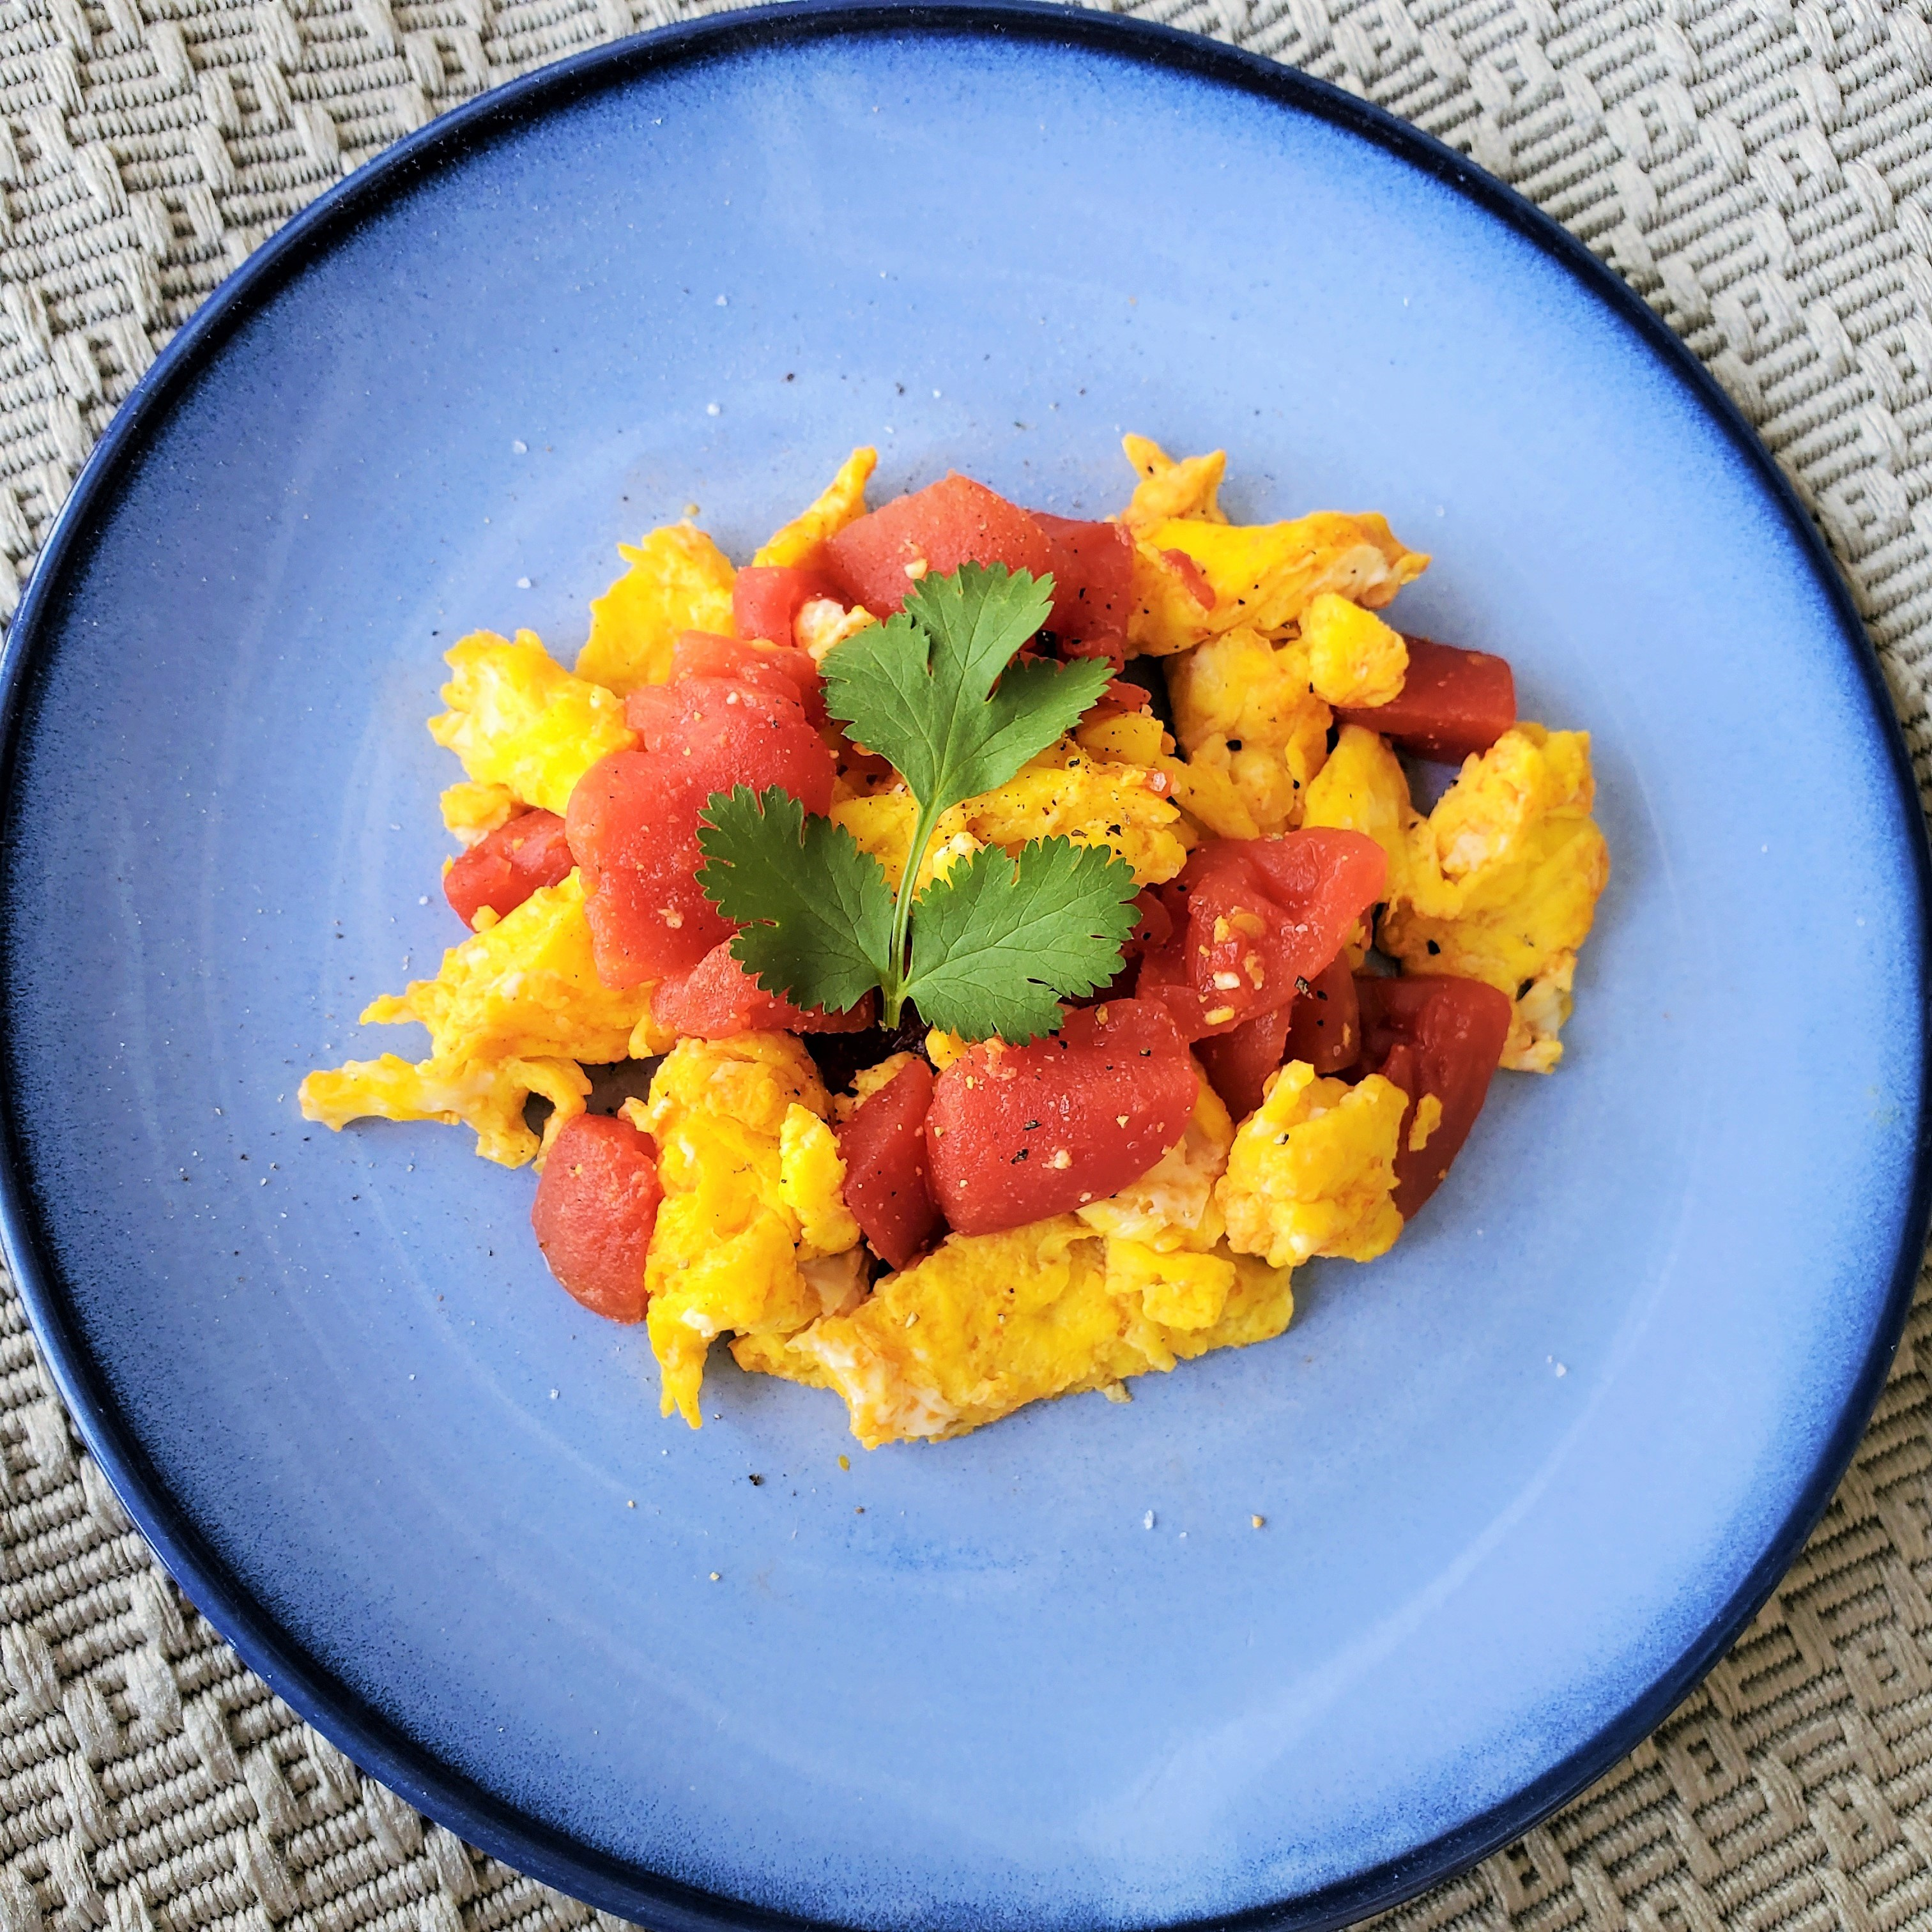 Scrambled Eggs and Tomatoes